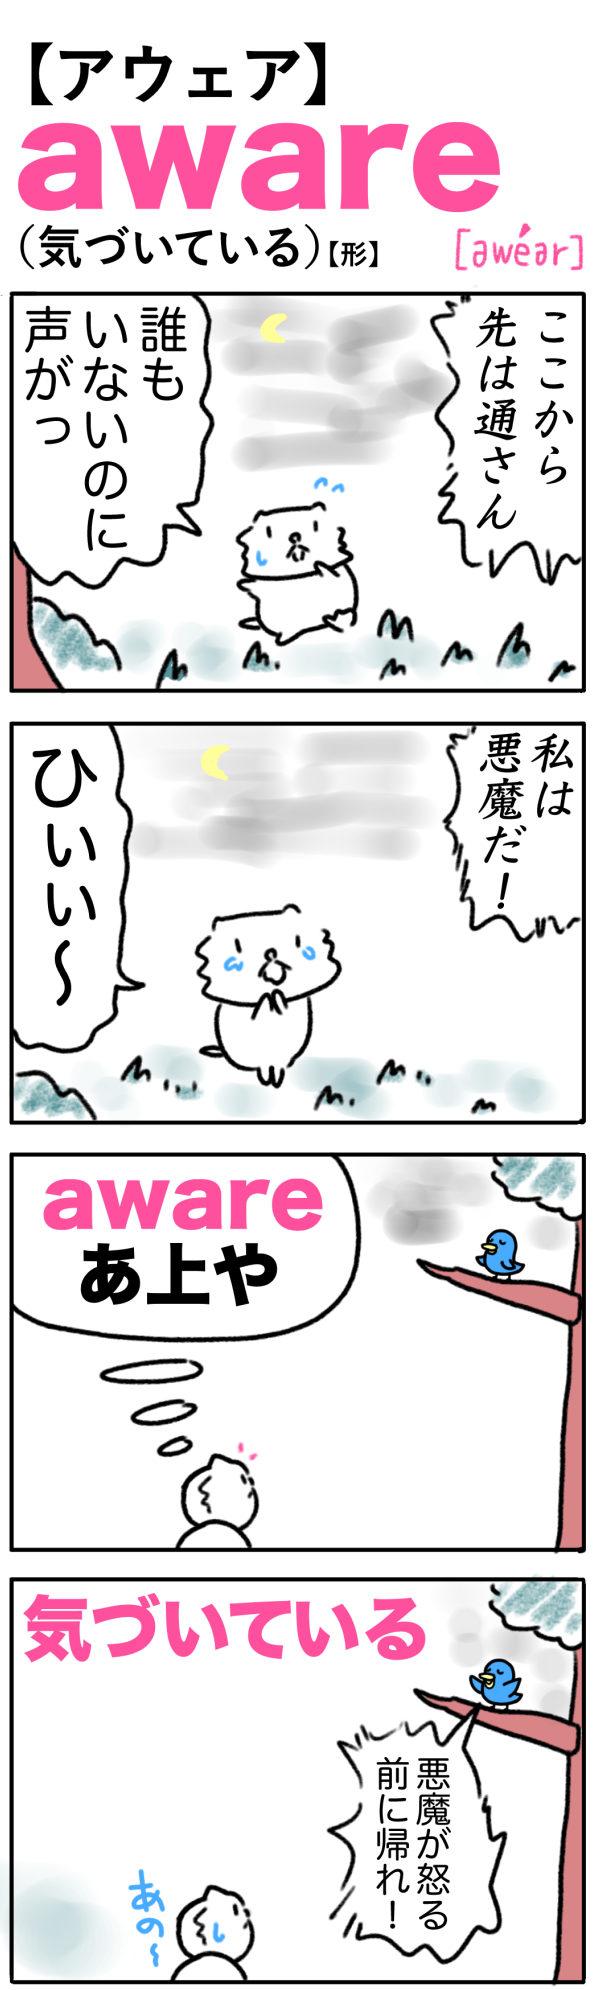 narrow(心の狭い)の語呂合わせ英単語